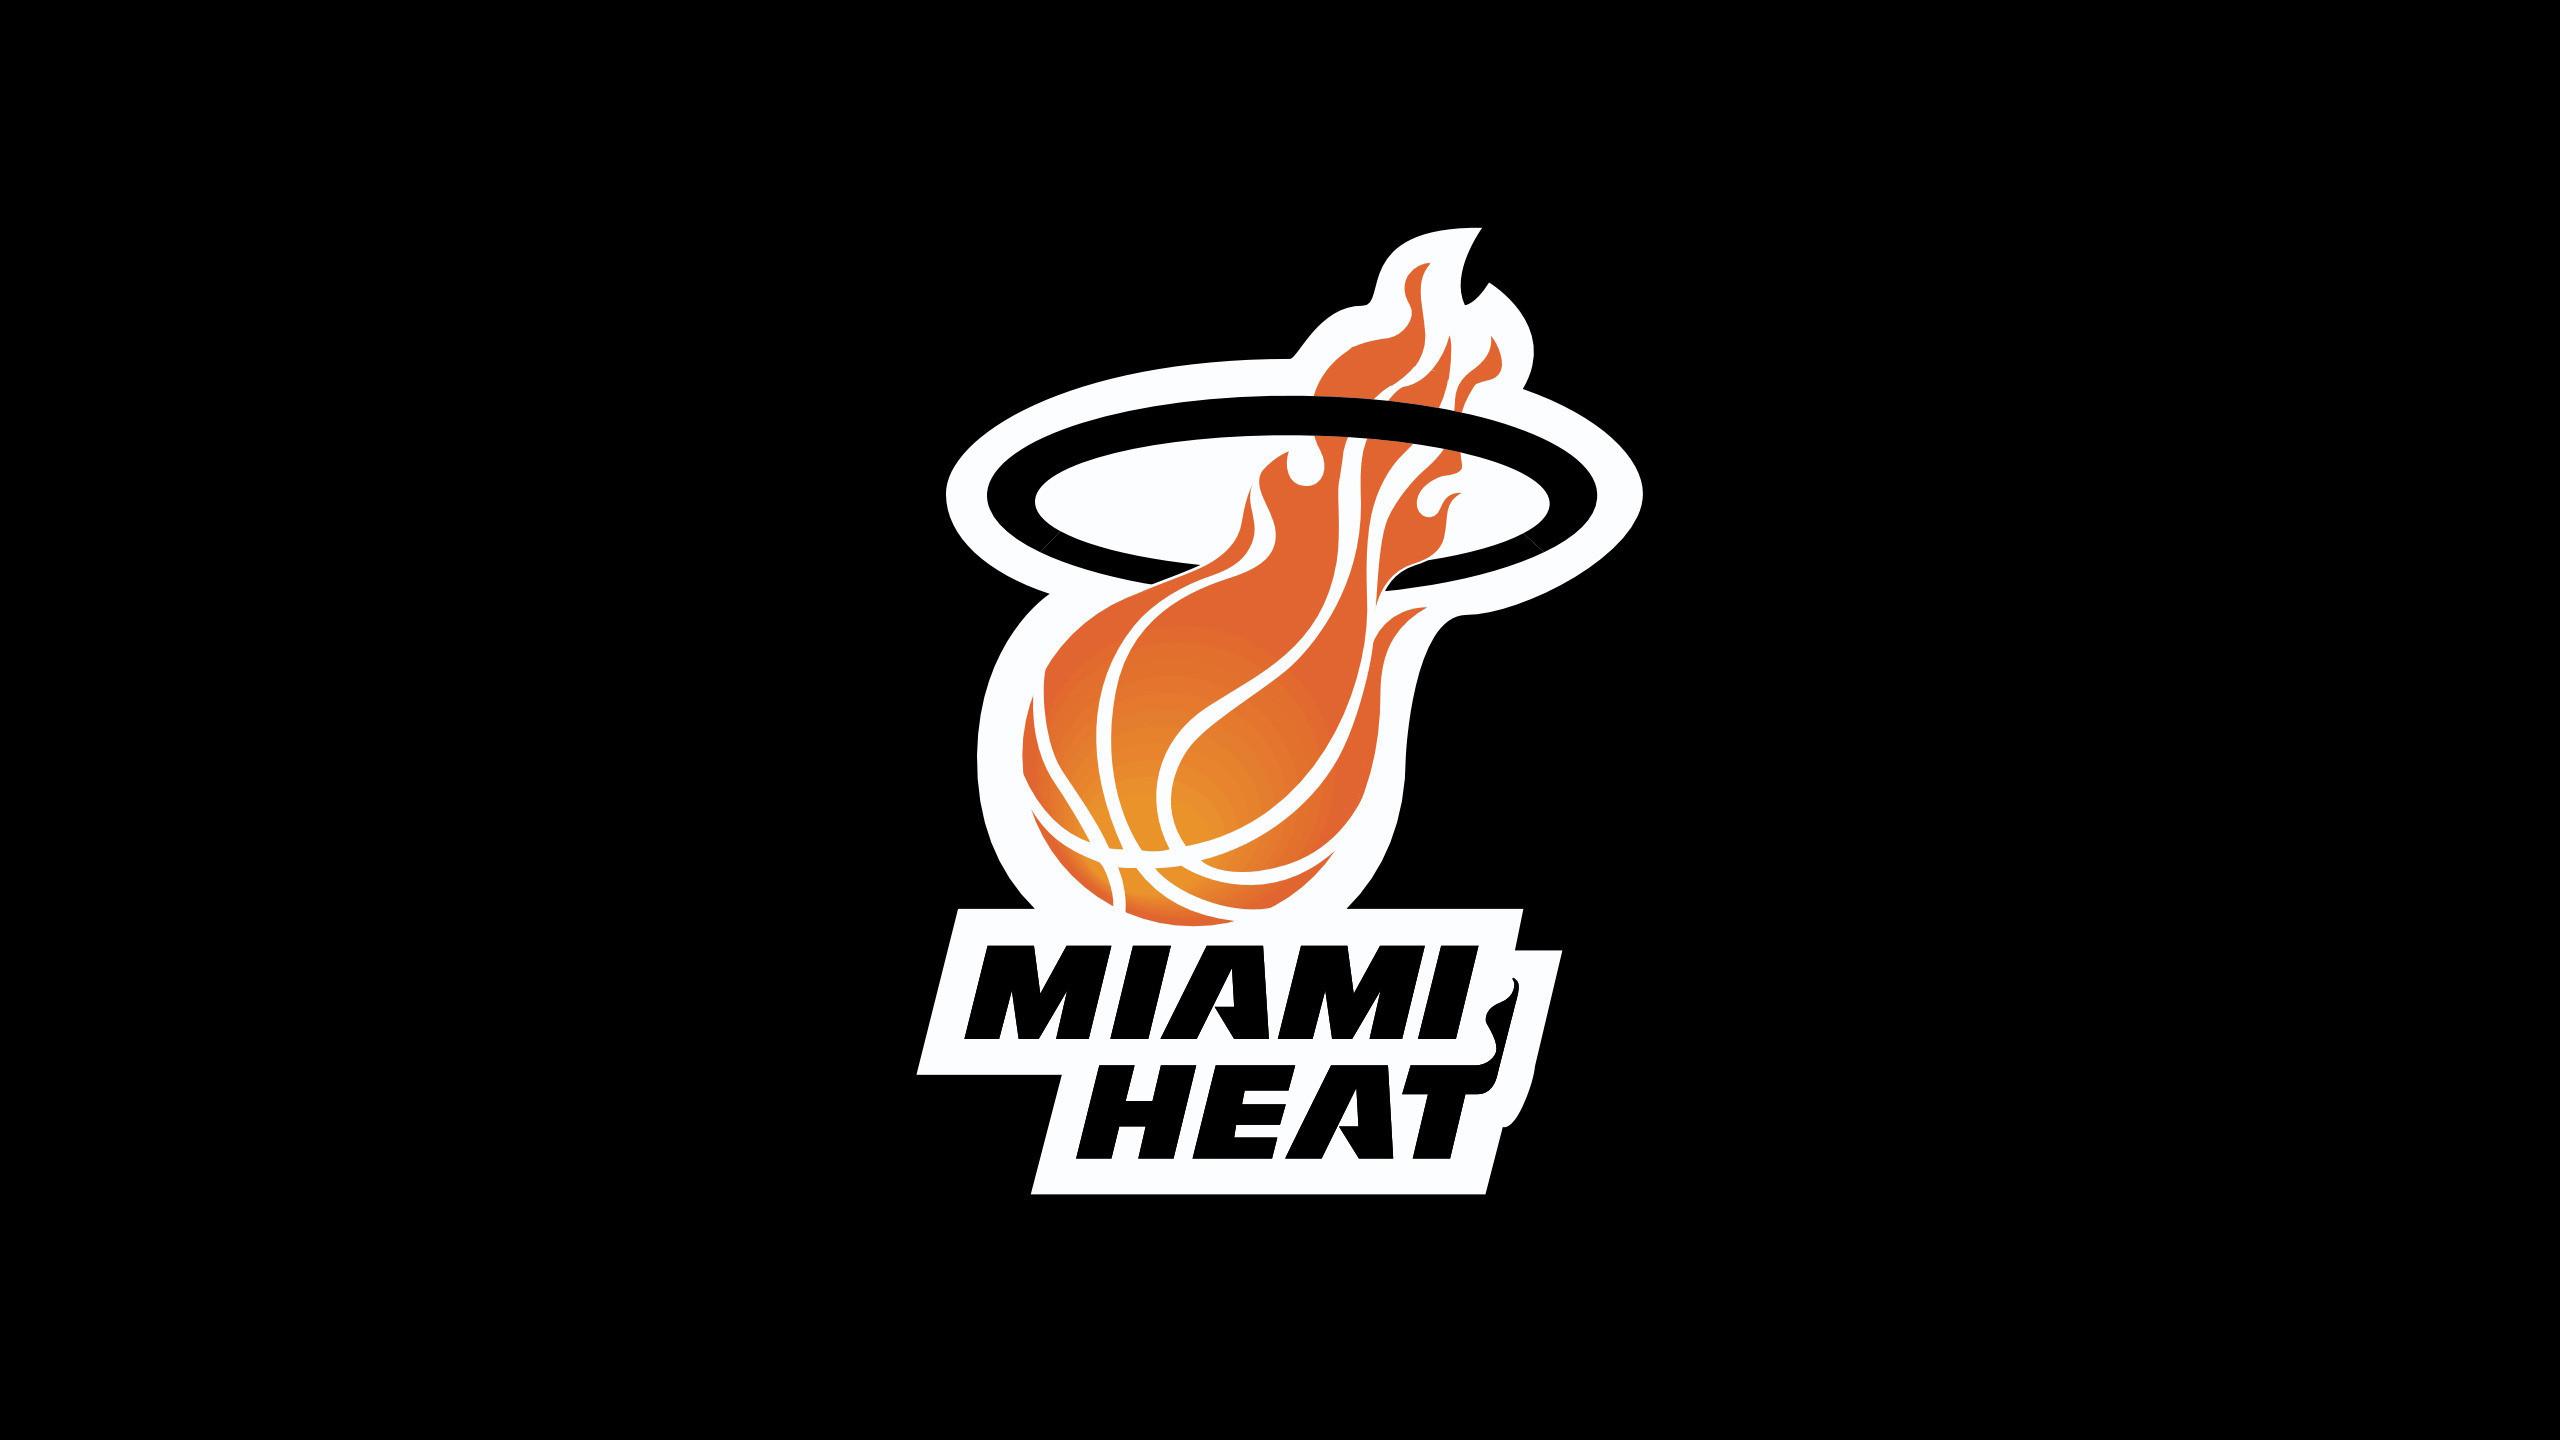 NBA miami heat team logo black wallpapers.